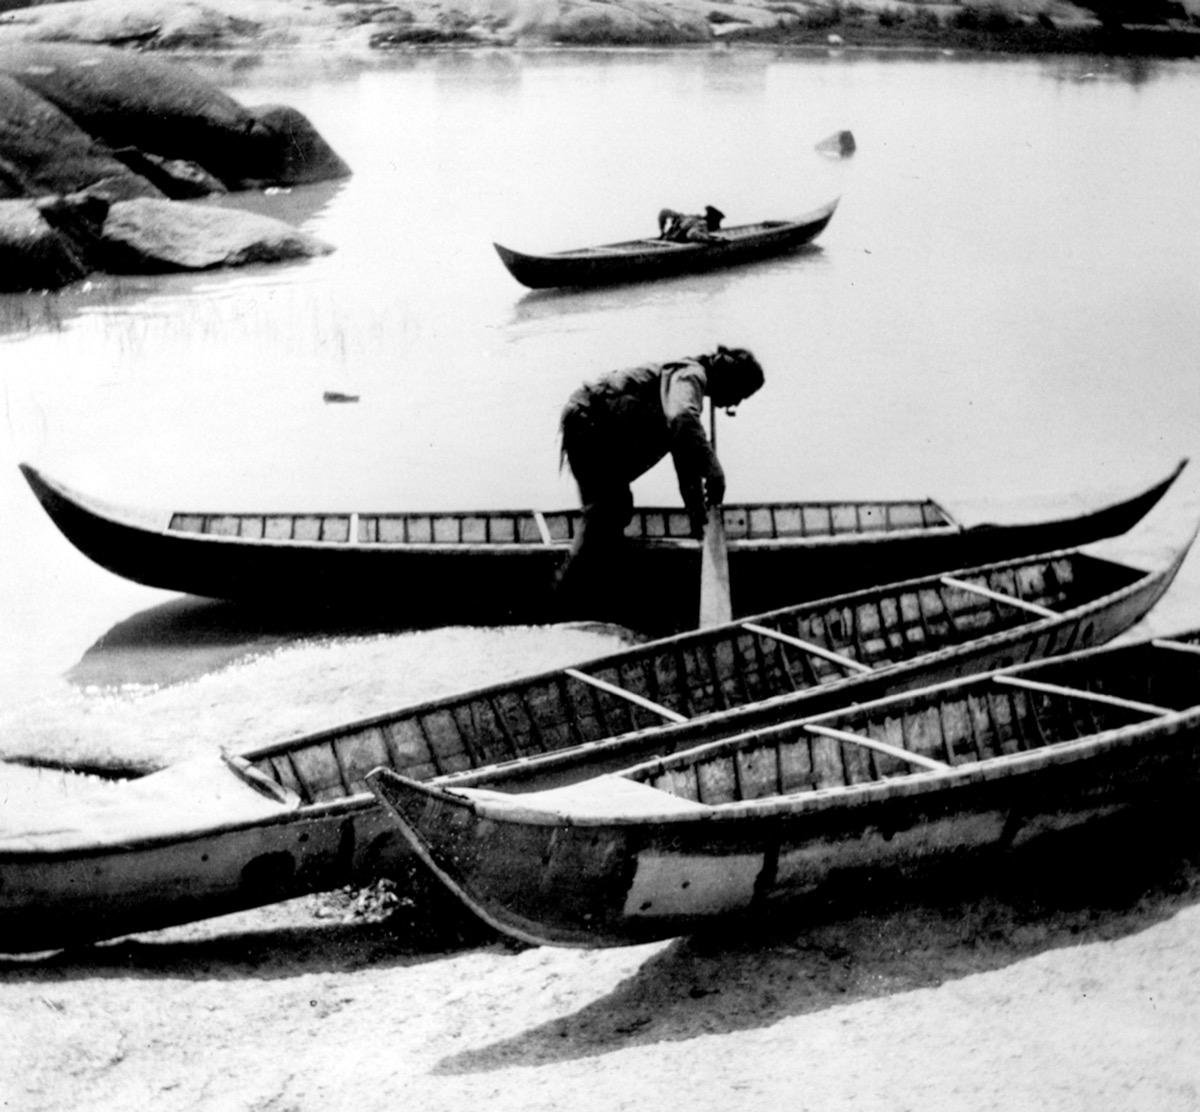 Dogrib Birchbark Canoe Project